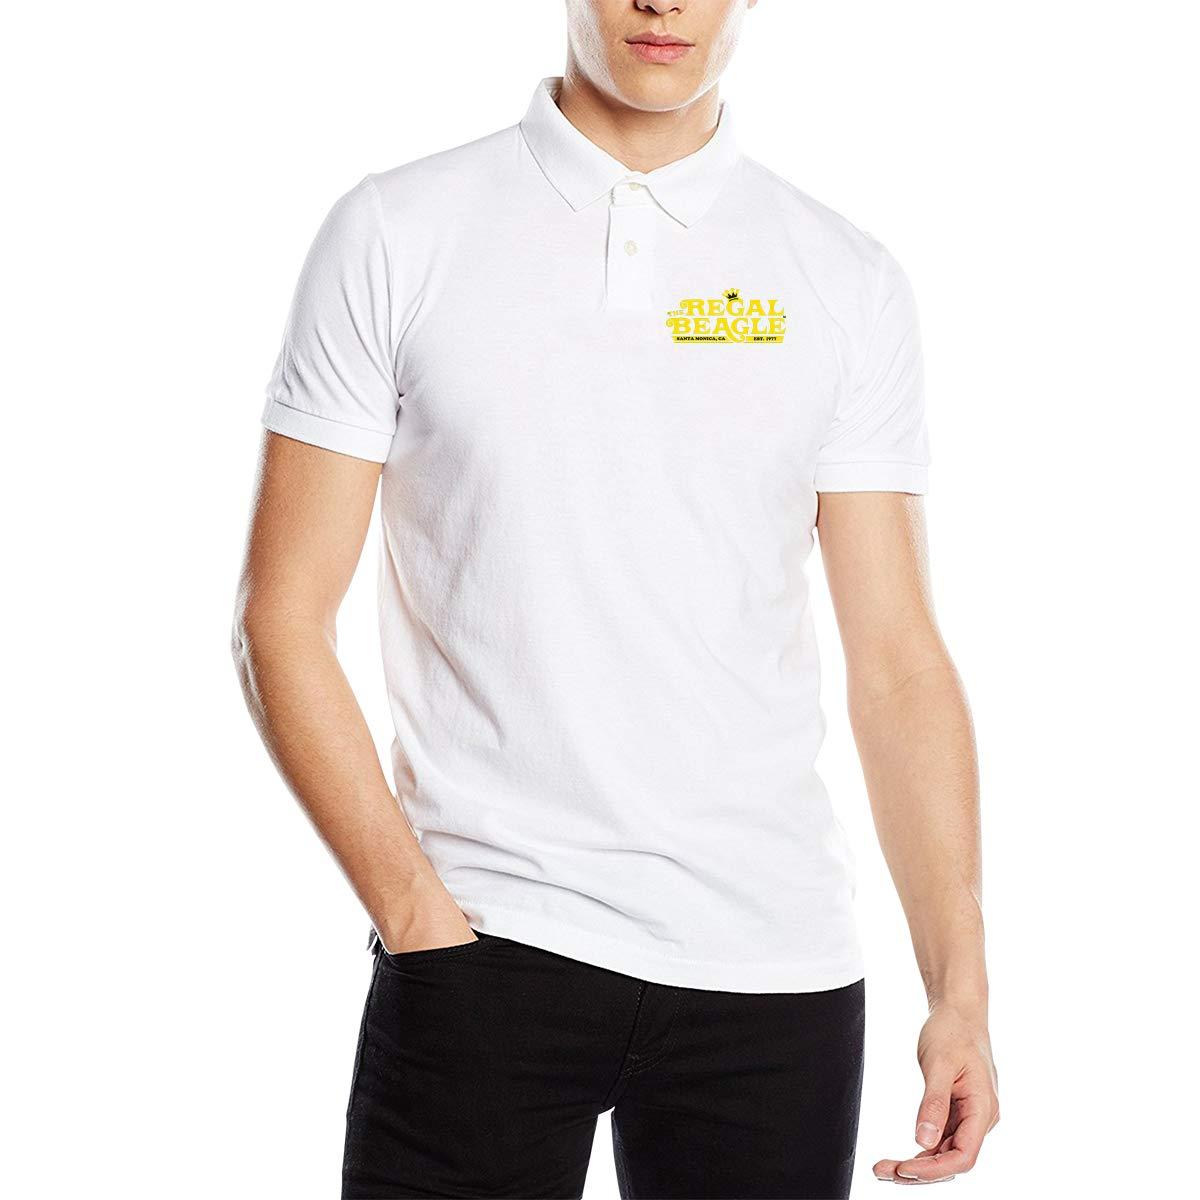 Gle Mens Regular-Fit Cotton Polo Shirt Short Sleeve The Regal Bea